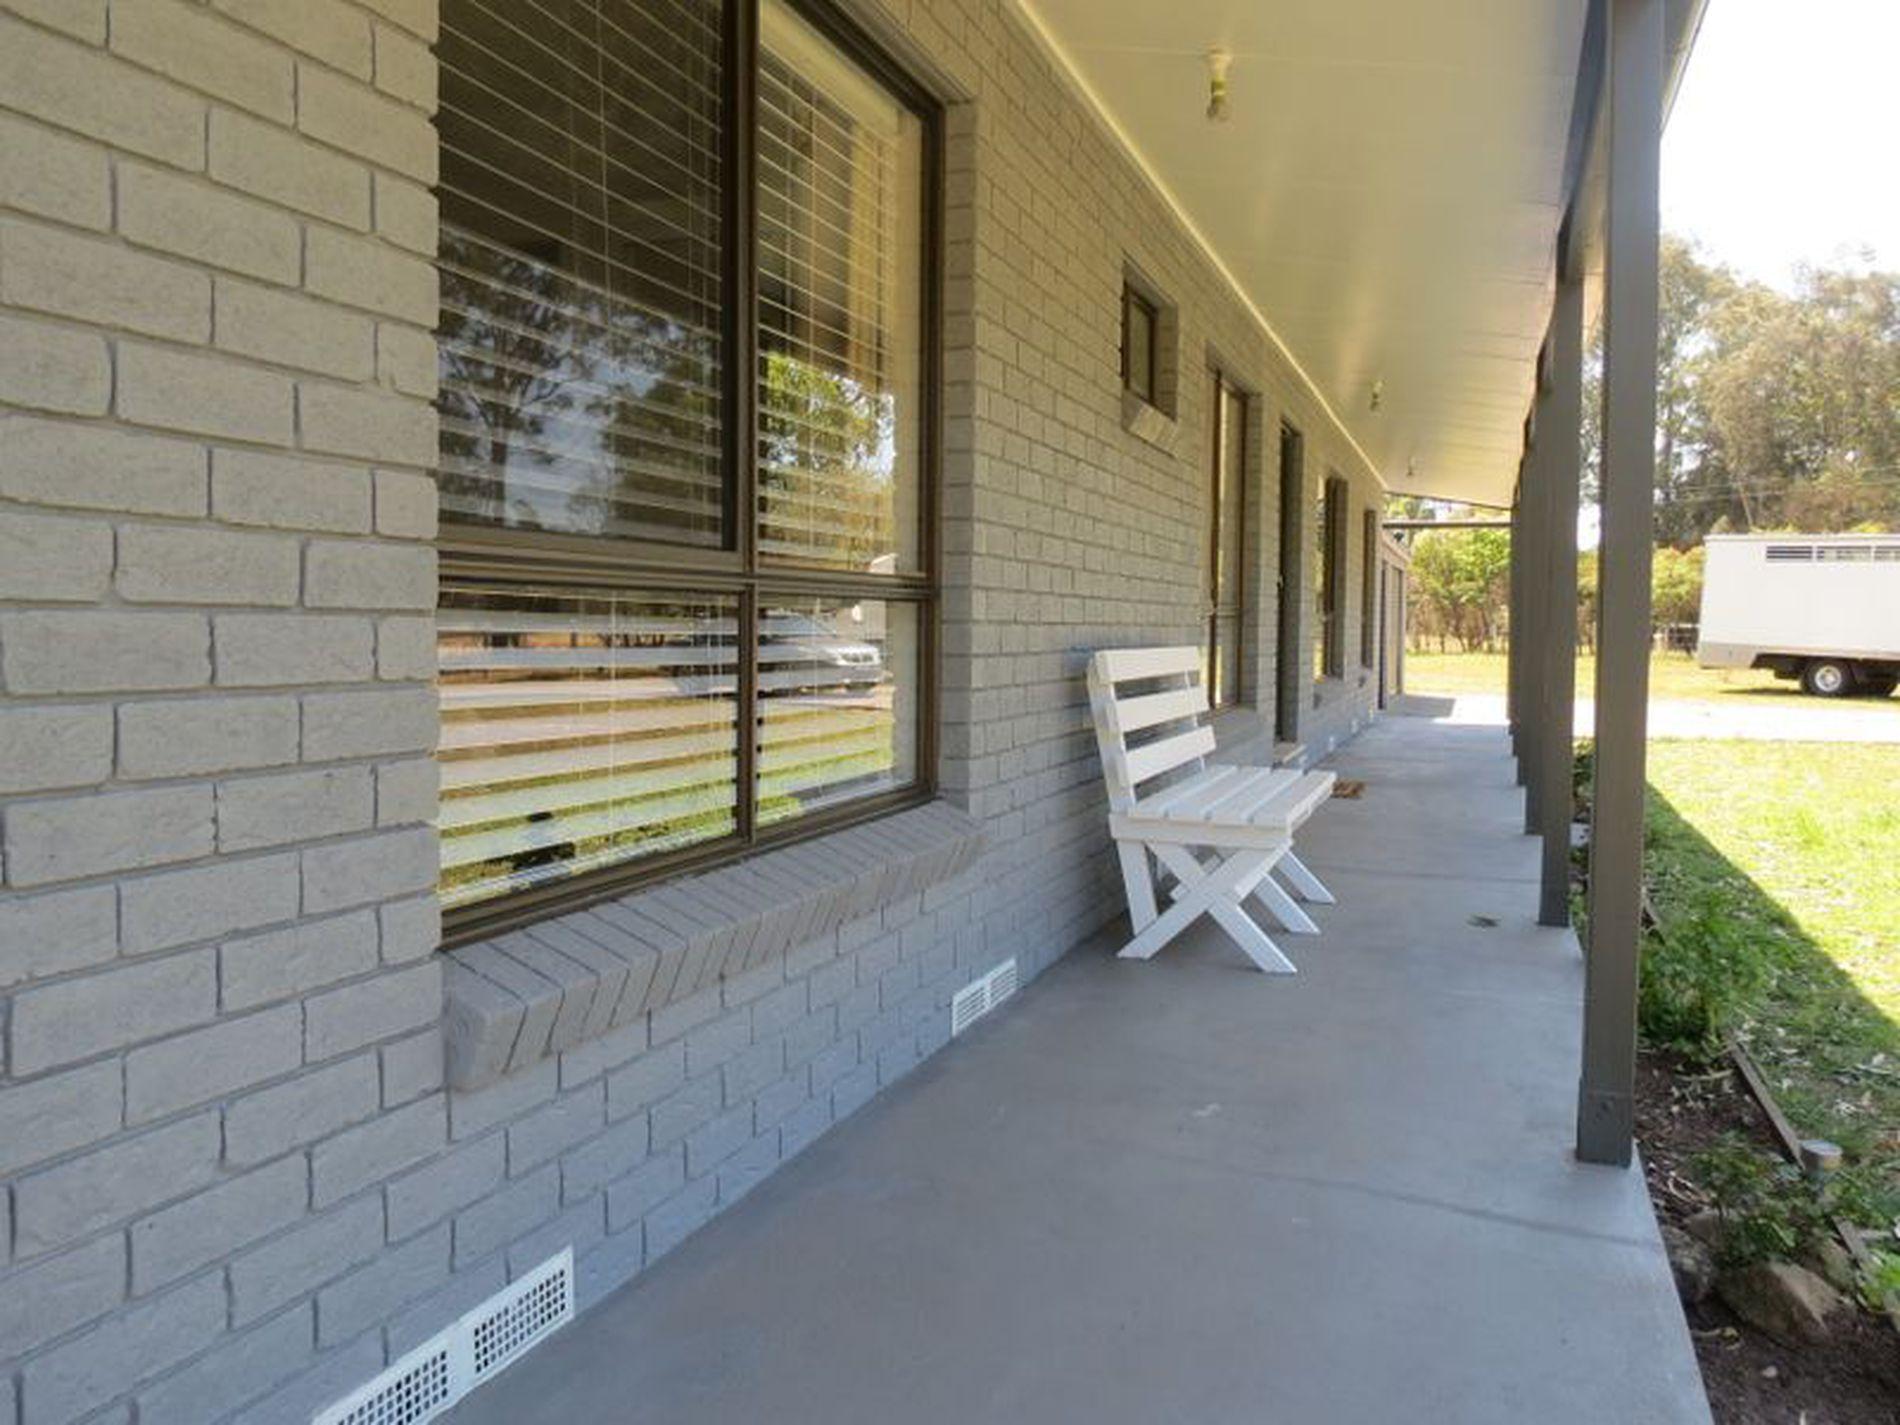 97 Glenthorne Rd, Glenthorne